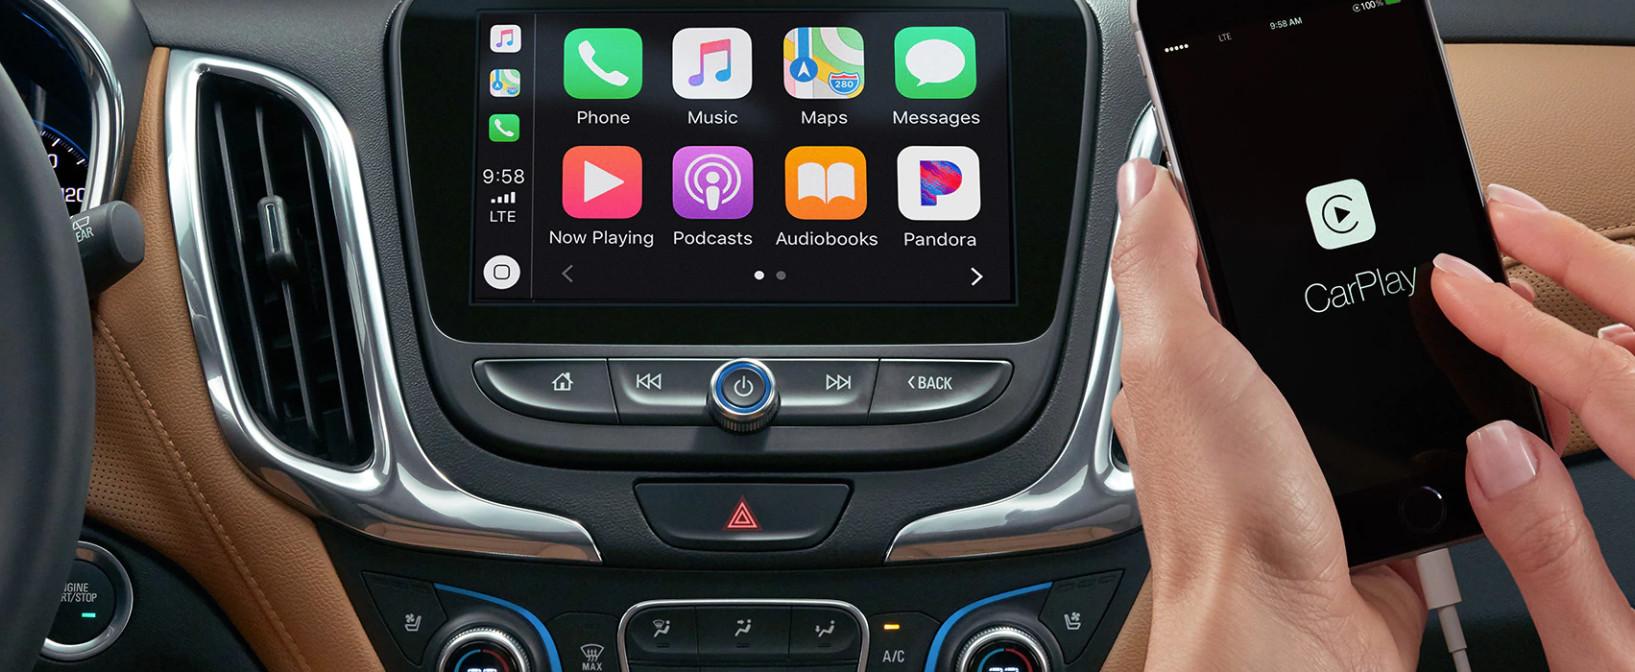 2020 Chevrolet Equinox Apple CarPlay™